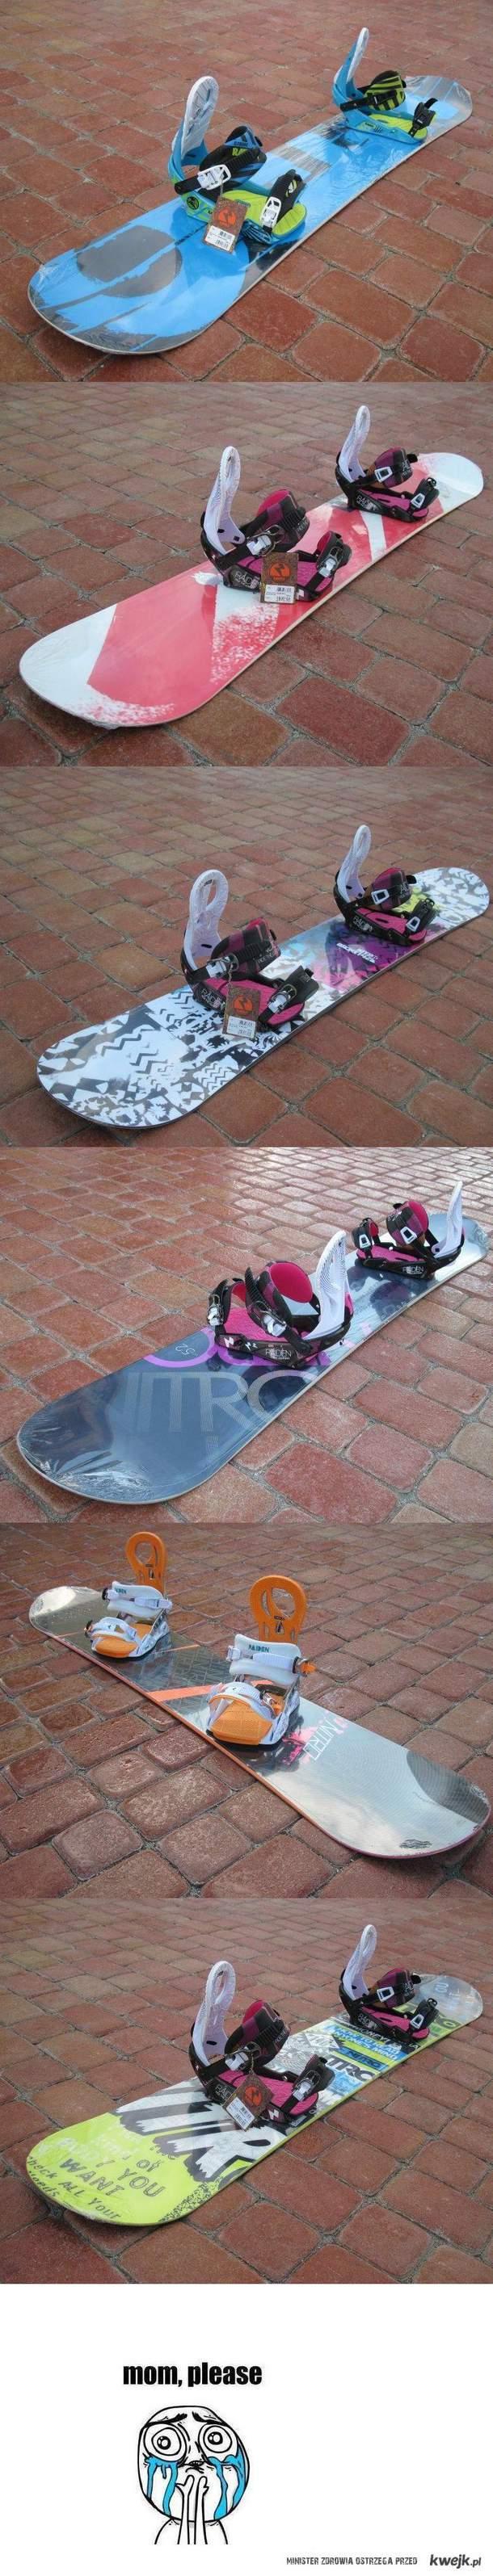 Snowboard <3  Mom please !